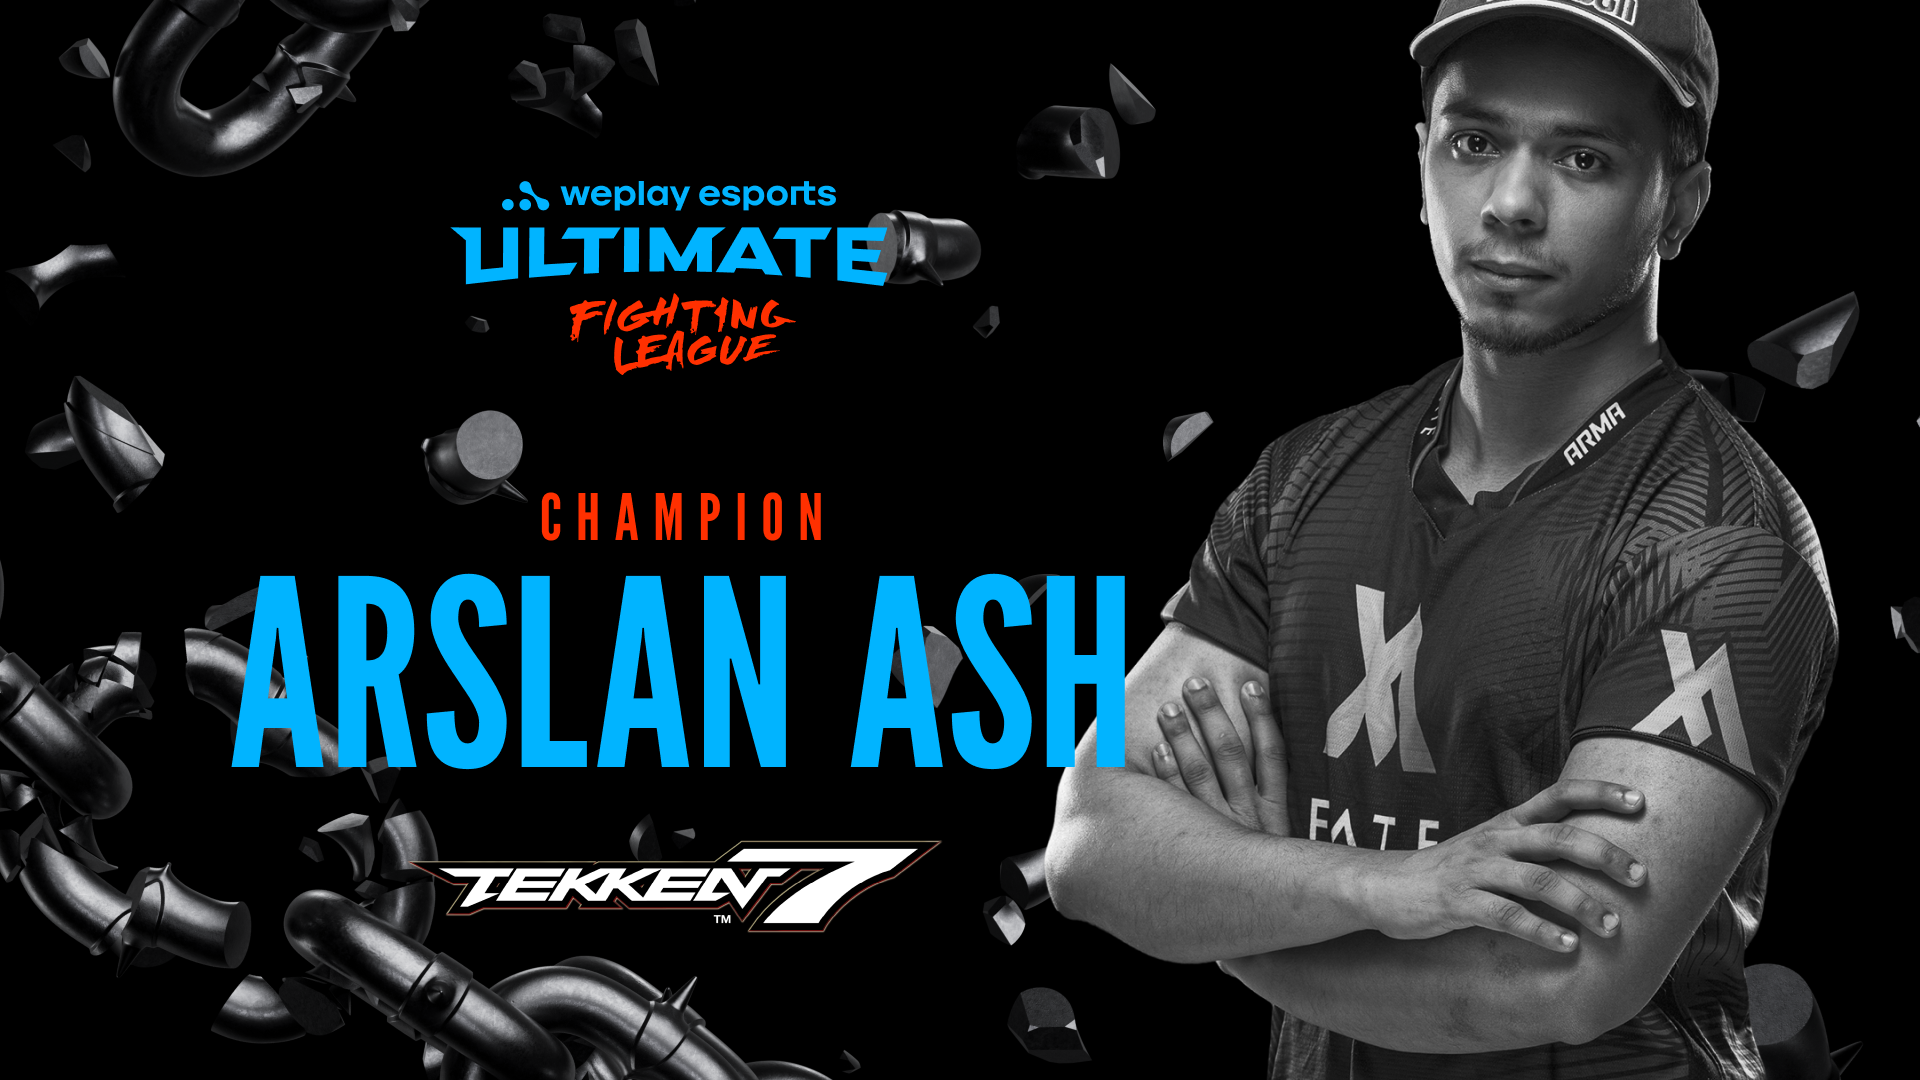 The winner of the WePlay Ultimate Fighting League Tekken 7